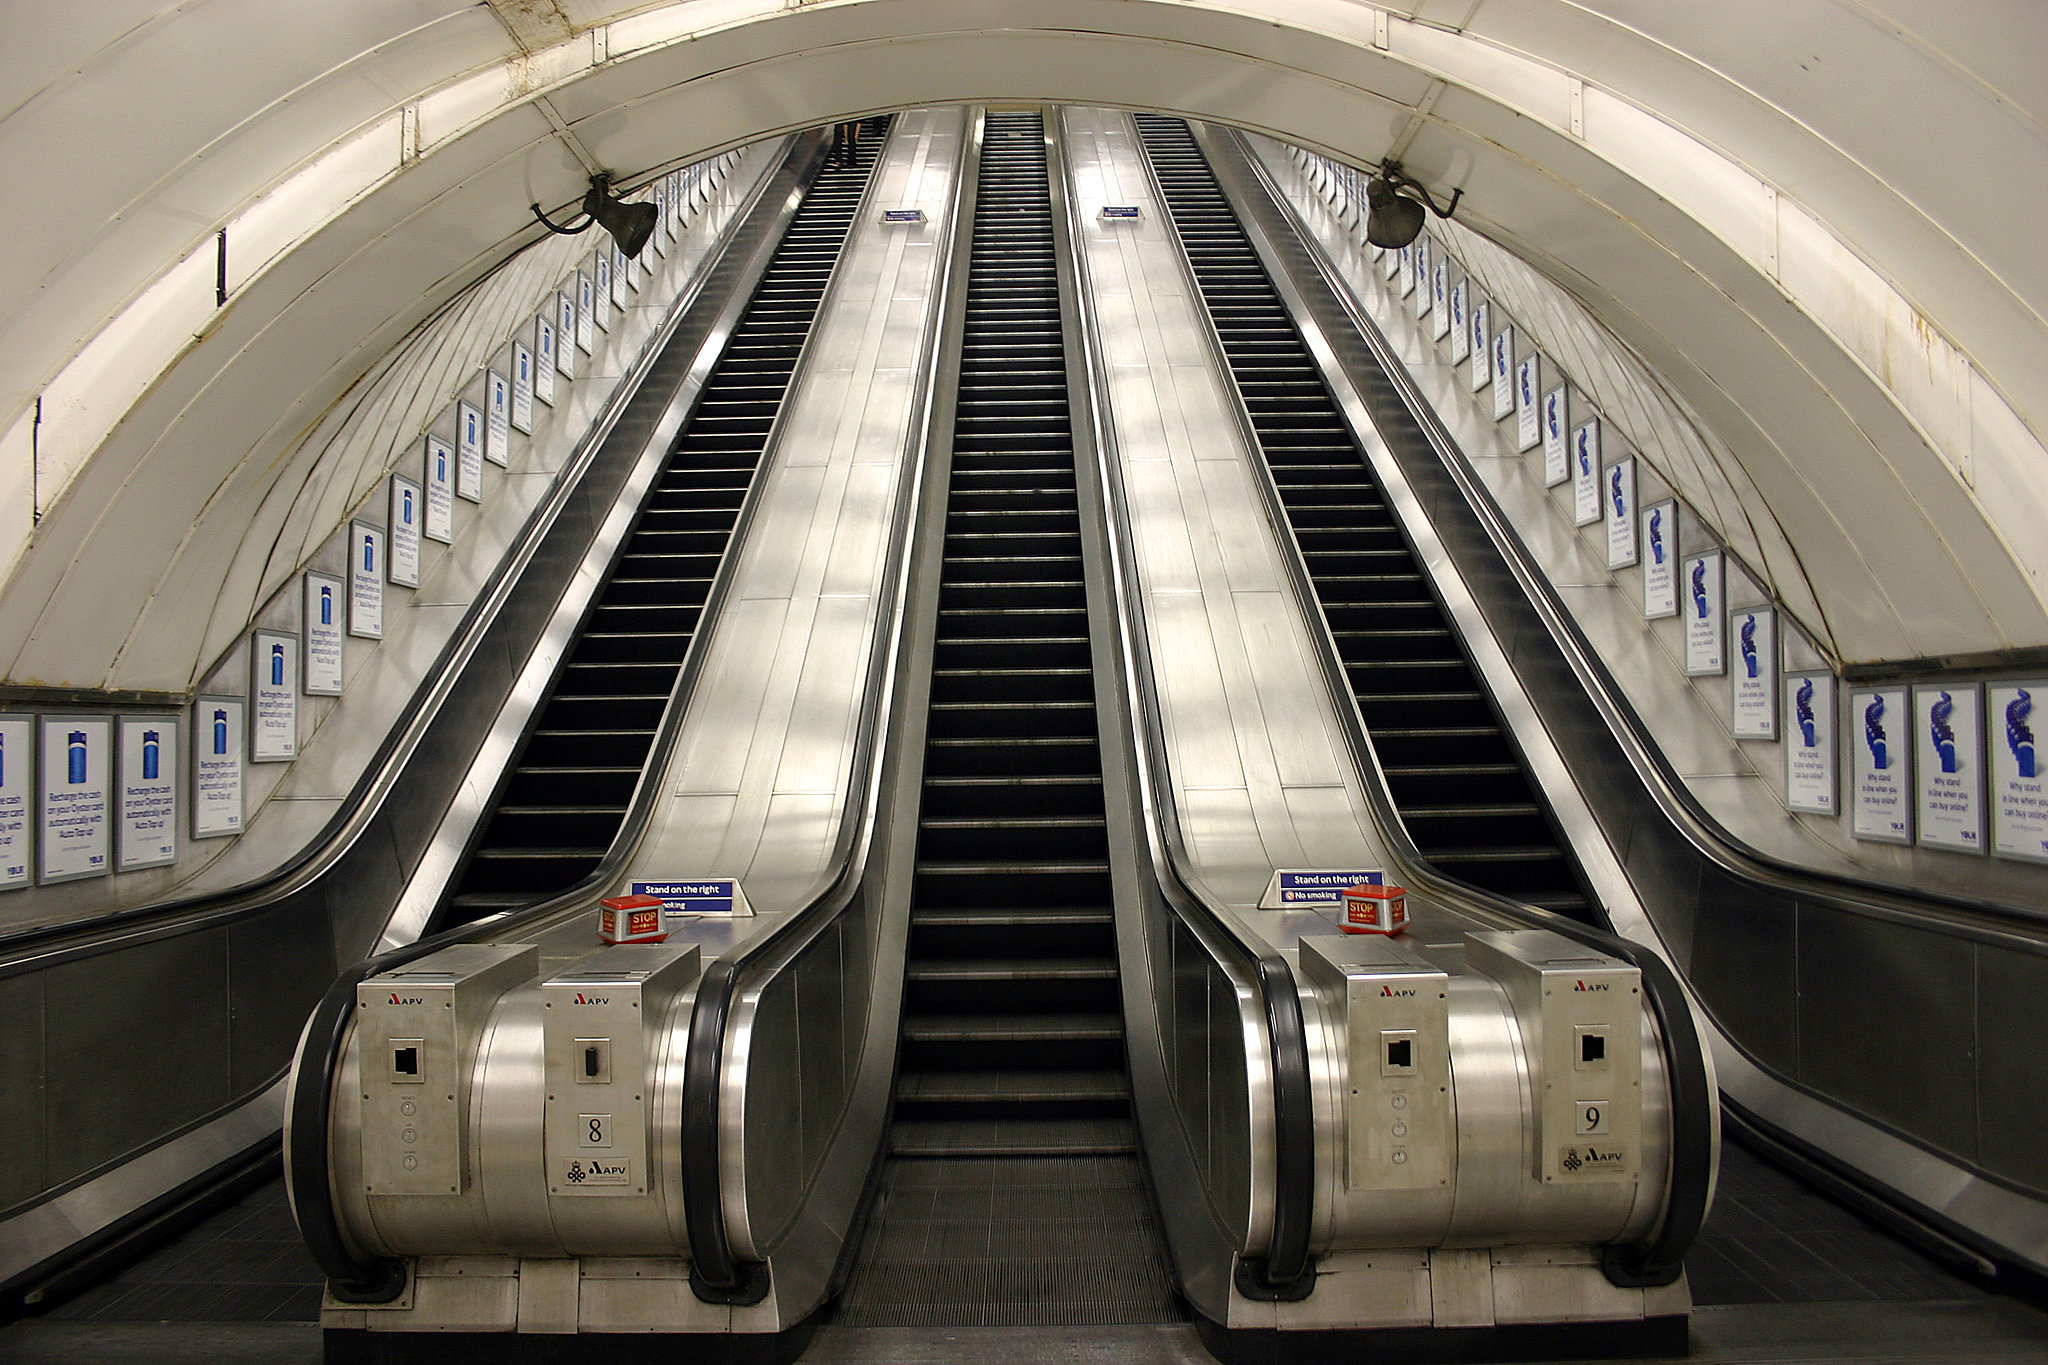 Follow the Universal Escalator Expectations